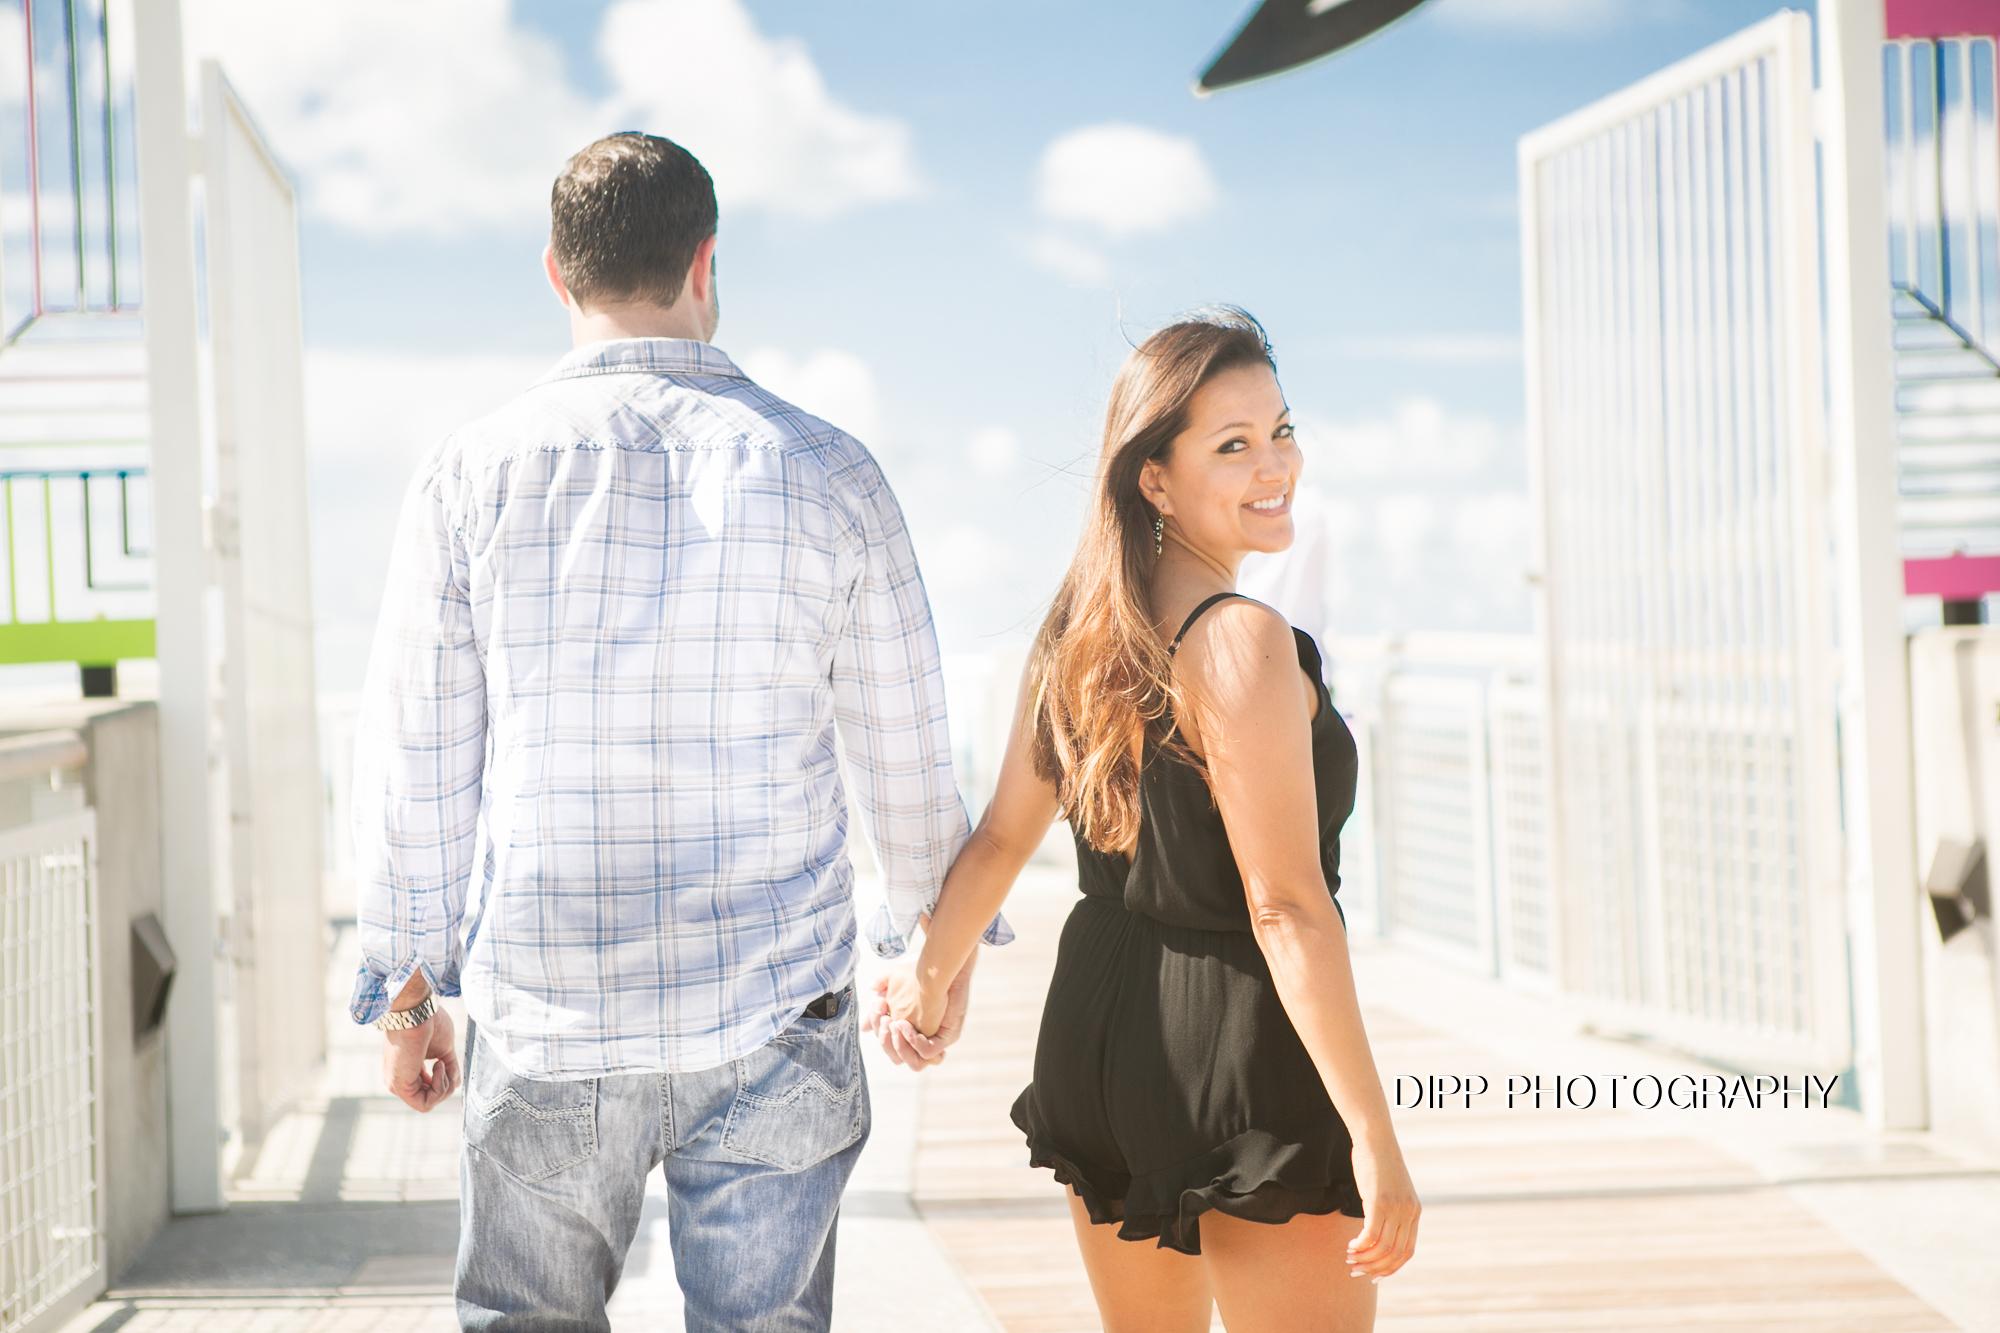 Dipp_2016 Brandon & Sara Mini Engagement Session-180-Edit